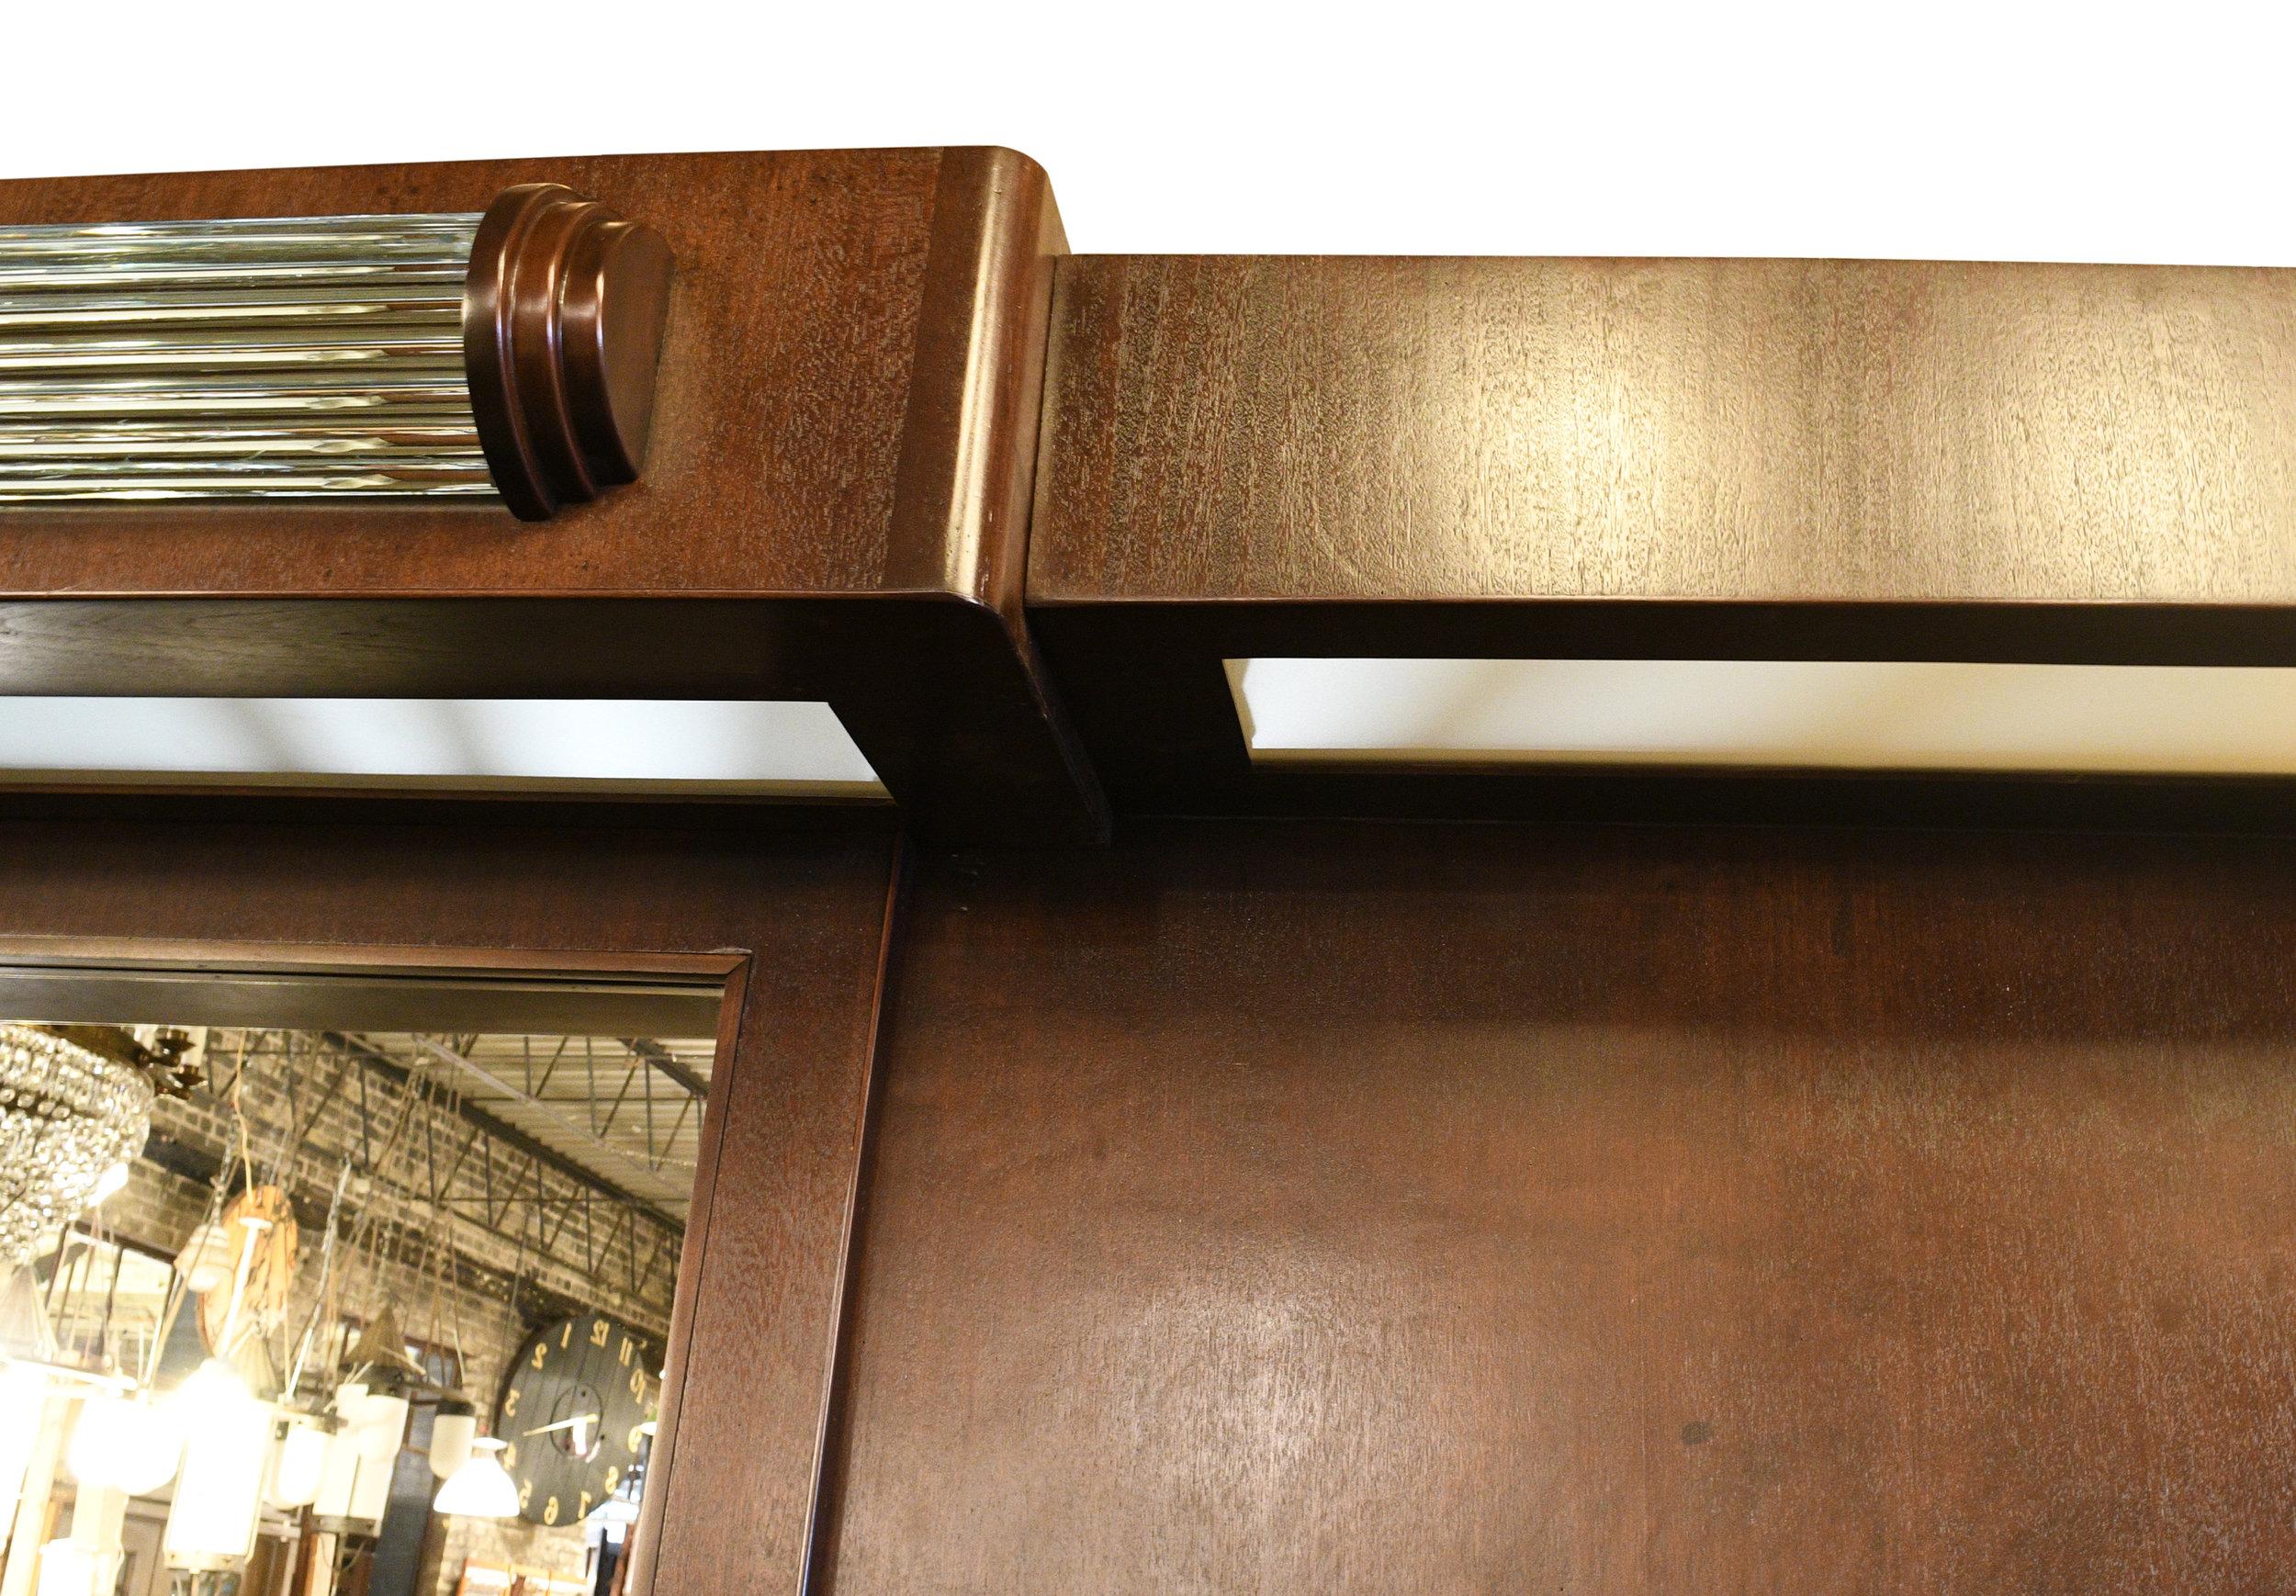 47687-art-deco-bar-with-glass-rods-details-9.jpg